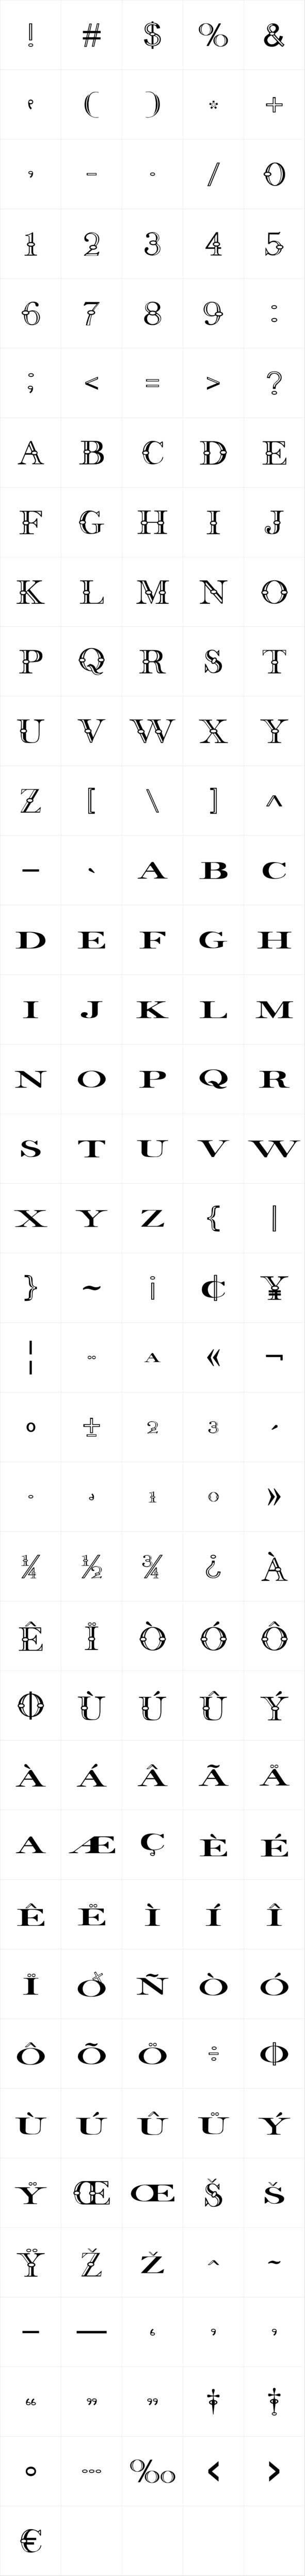 Fry s Alphabet